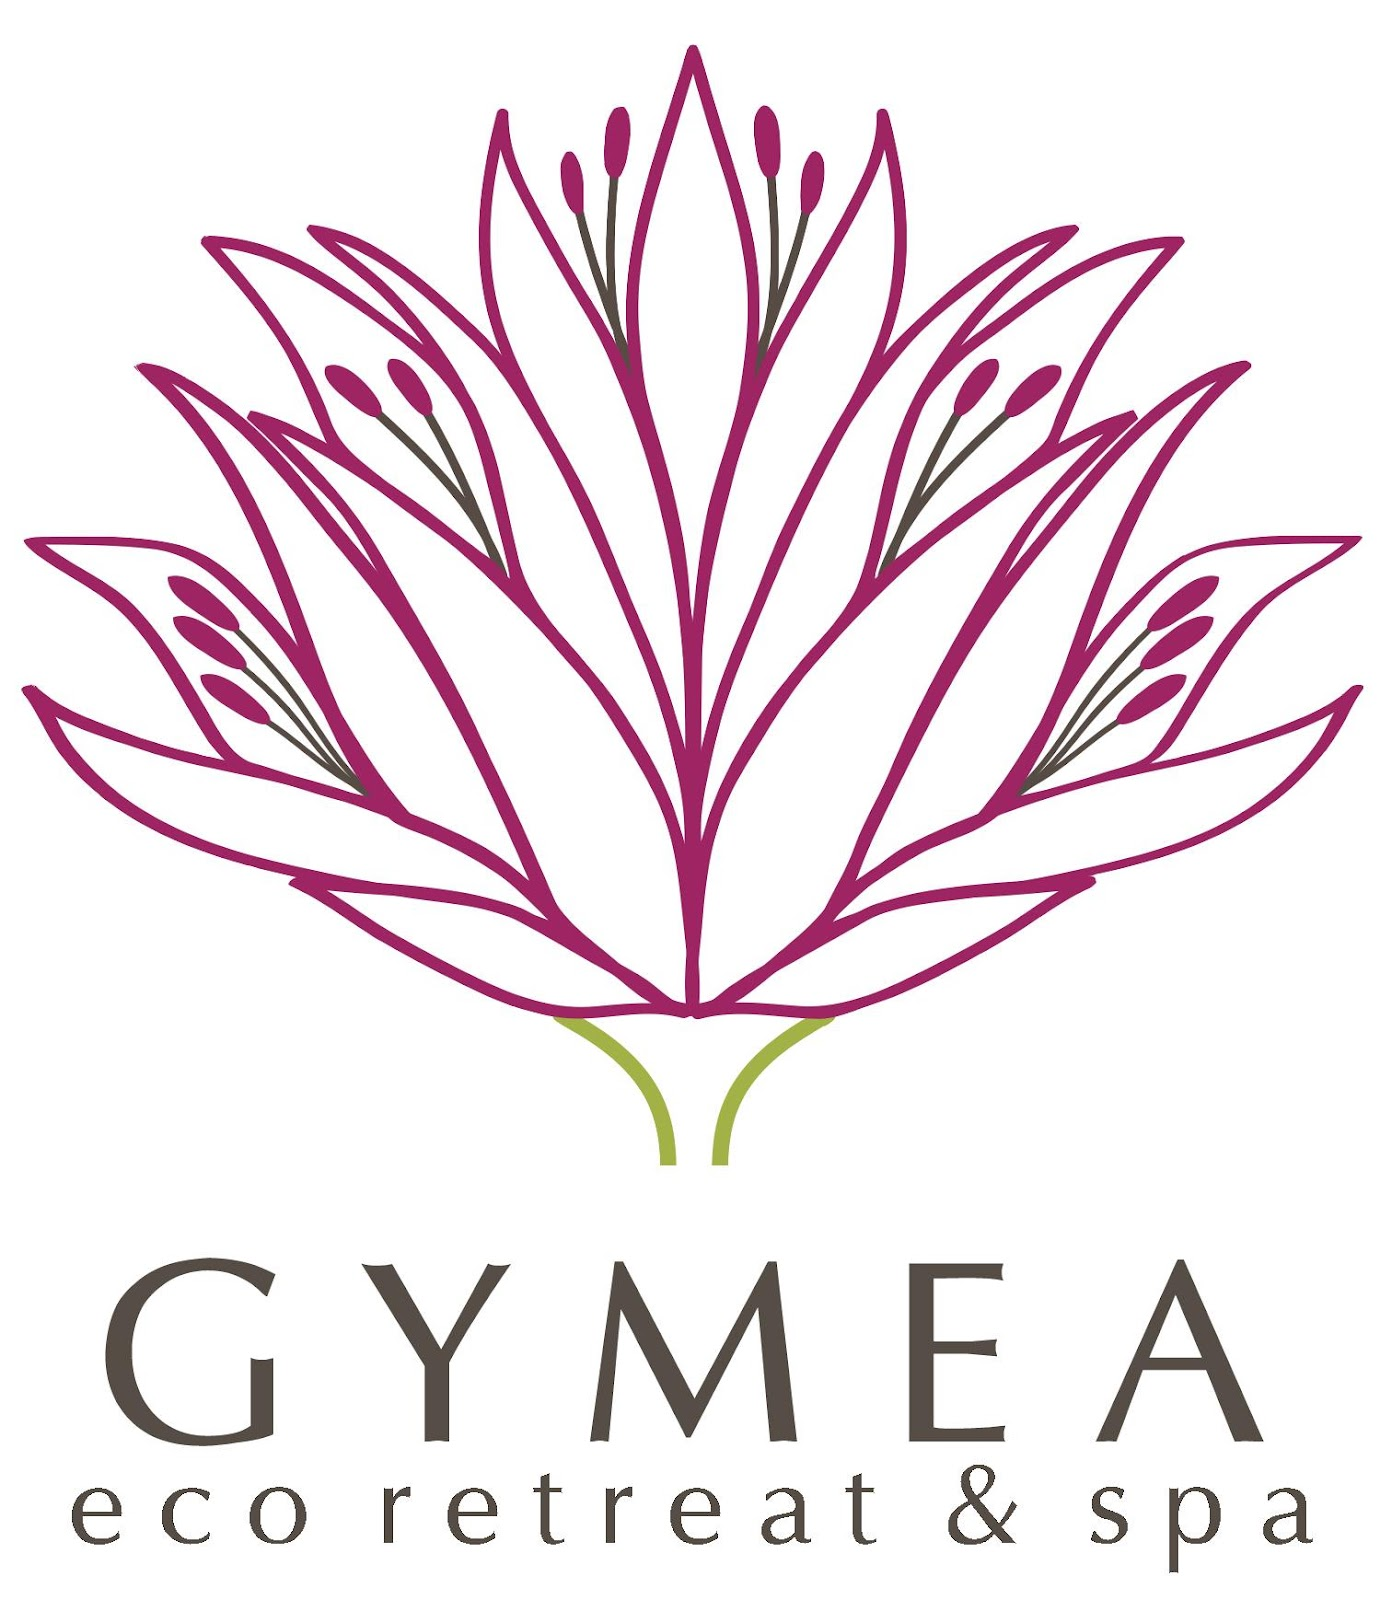 C:\Users\Stephen Armytage\Documents\My Dropbox\AA Gymea\Gymea Images\Logo\logo by Marius\printspot final versions\Gymea Lily head, stem & title.jpg